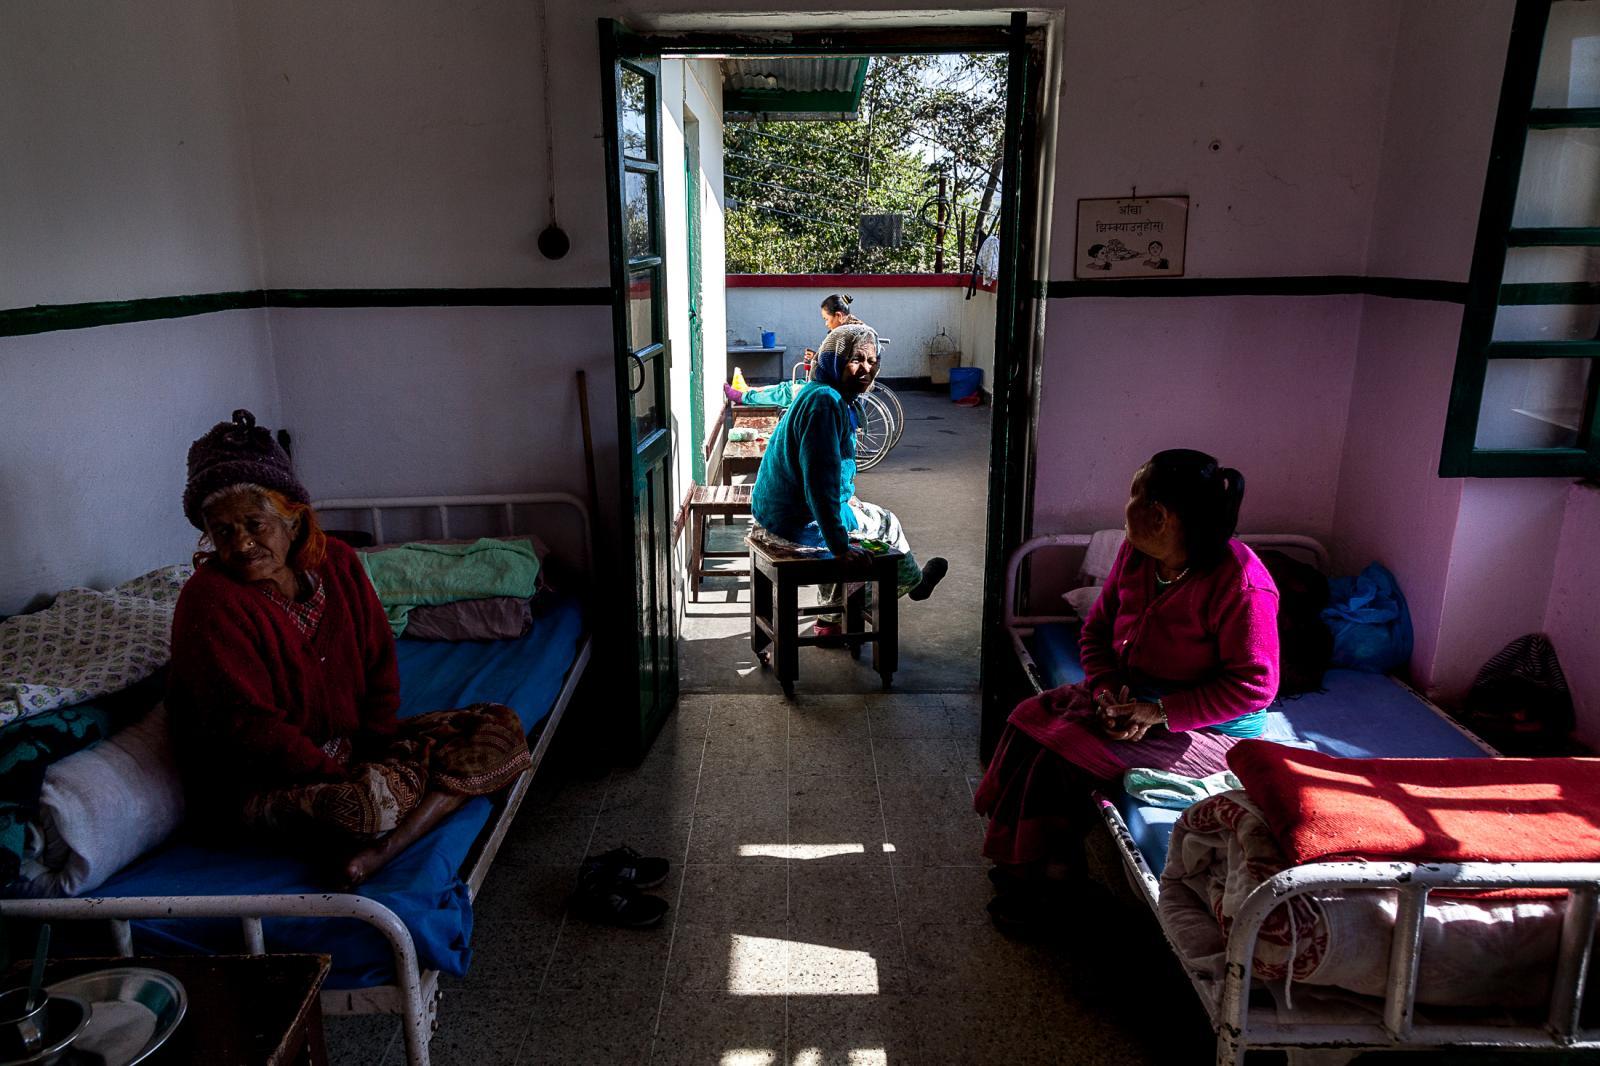 Photography image - Loading 003_Leprosy-Nepal-Omar-Havana.jpg